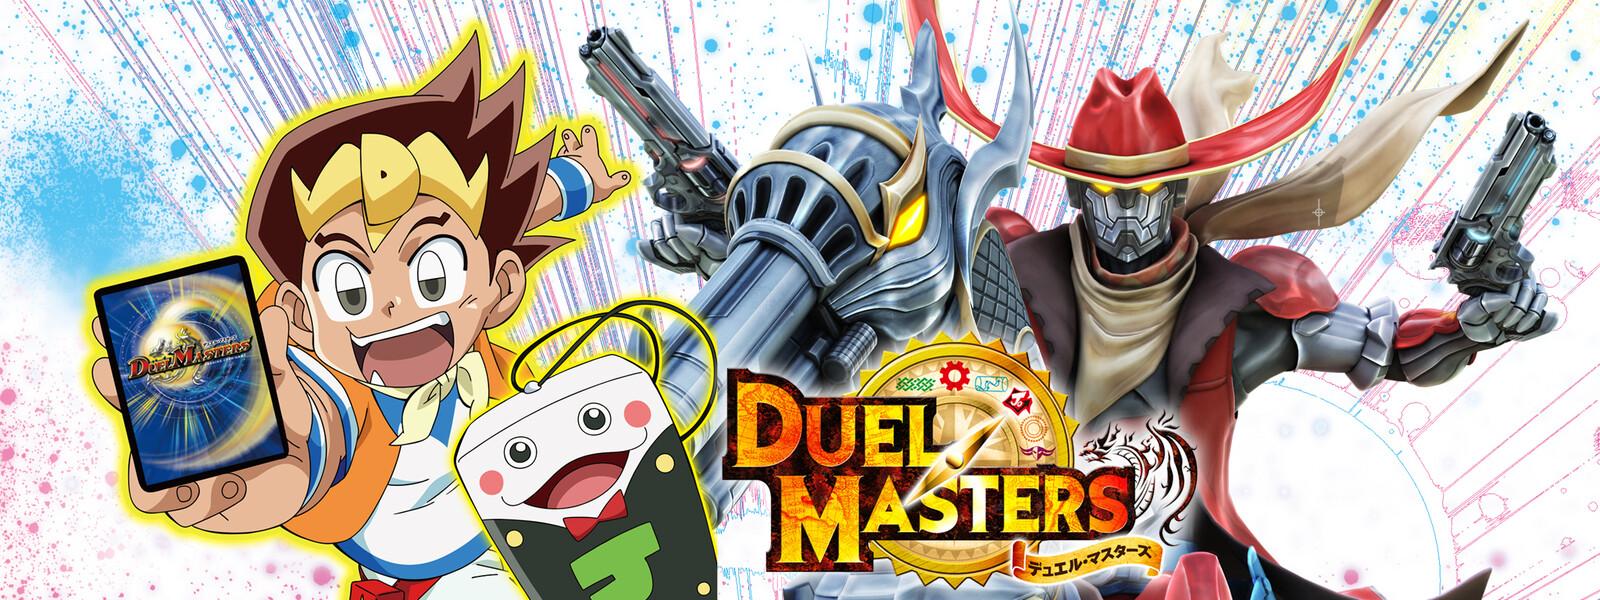 50028929 series art  768x2048 duel masters 2017 a66d79c5be128dfa370faa0f0e97266e